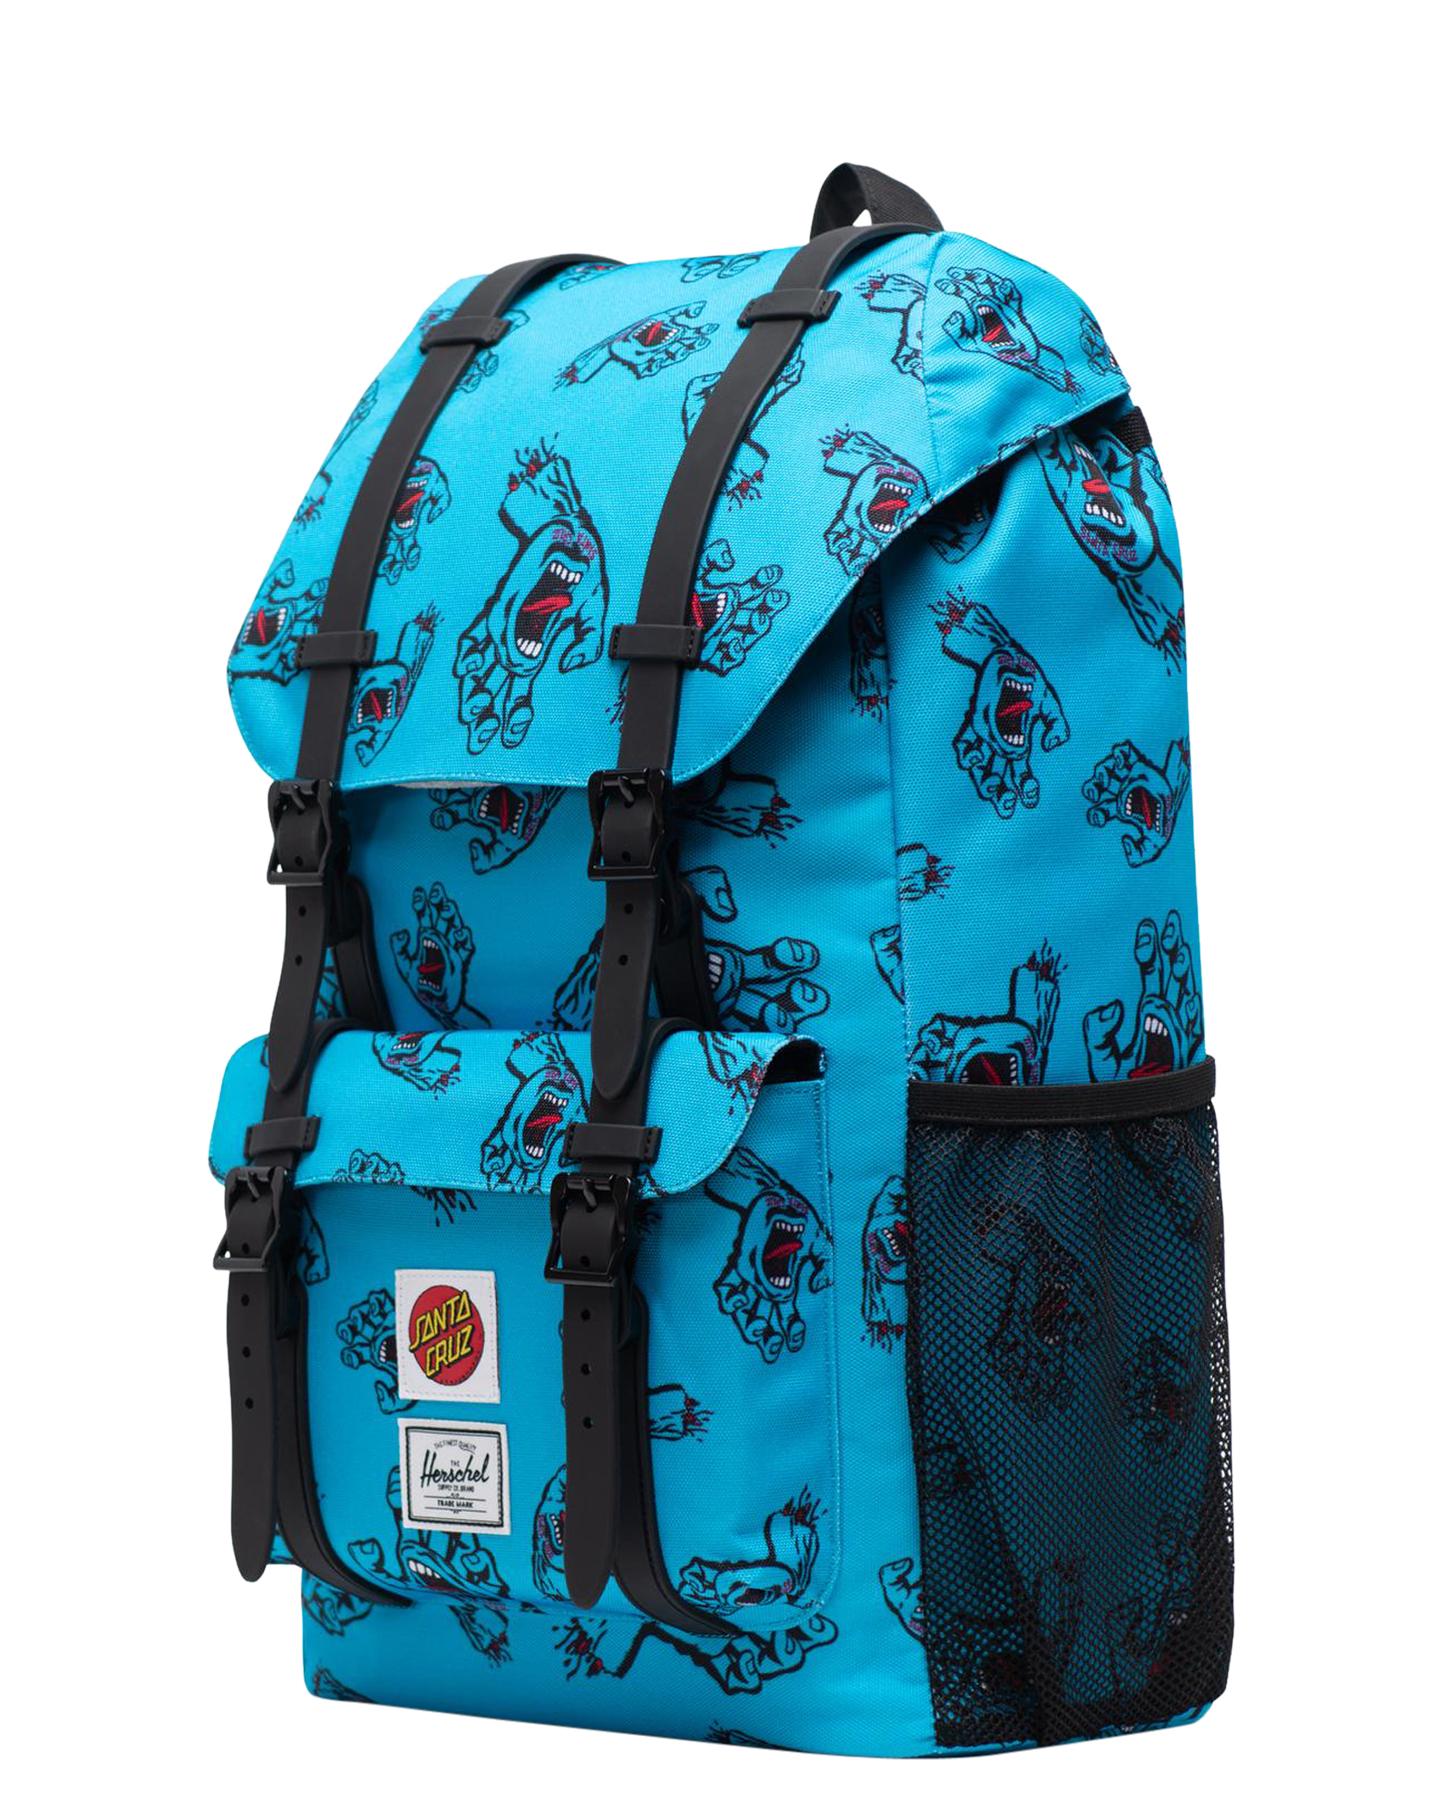 607c05d1f ... SANTA CRUZ BLUE KIDS BOYS HERSCHEL SUPPLY CO BAGS + BACKPACKS -  10589-02573- ...